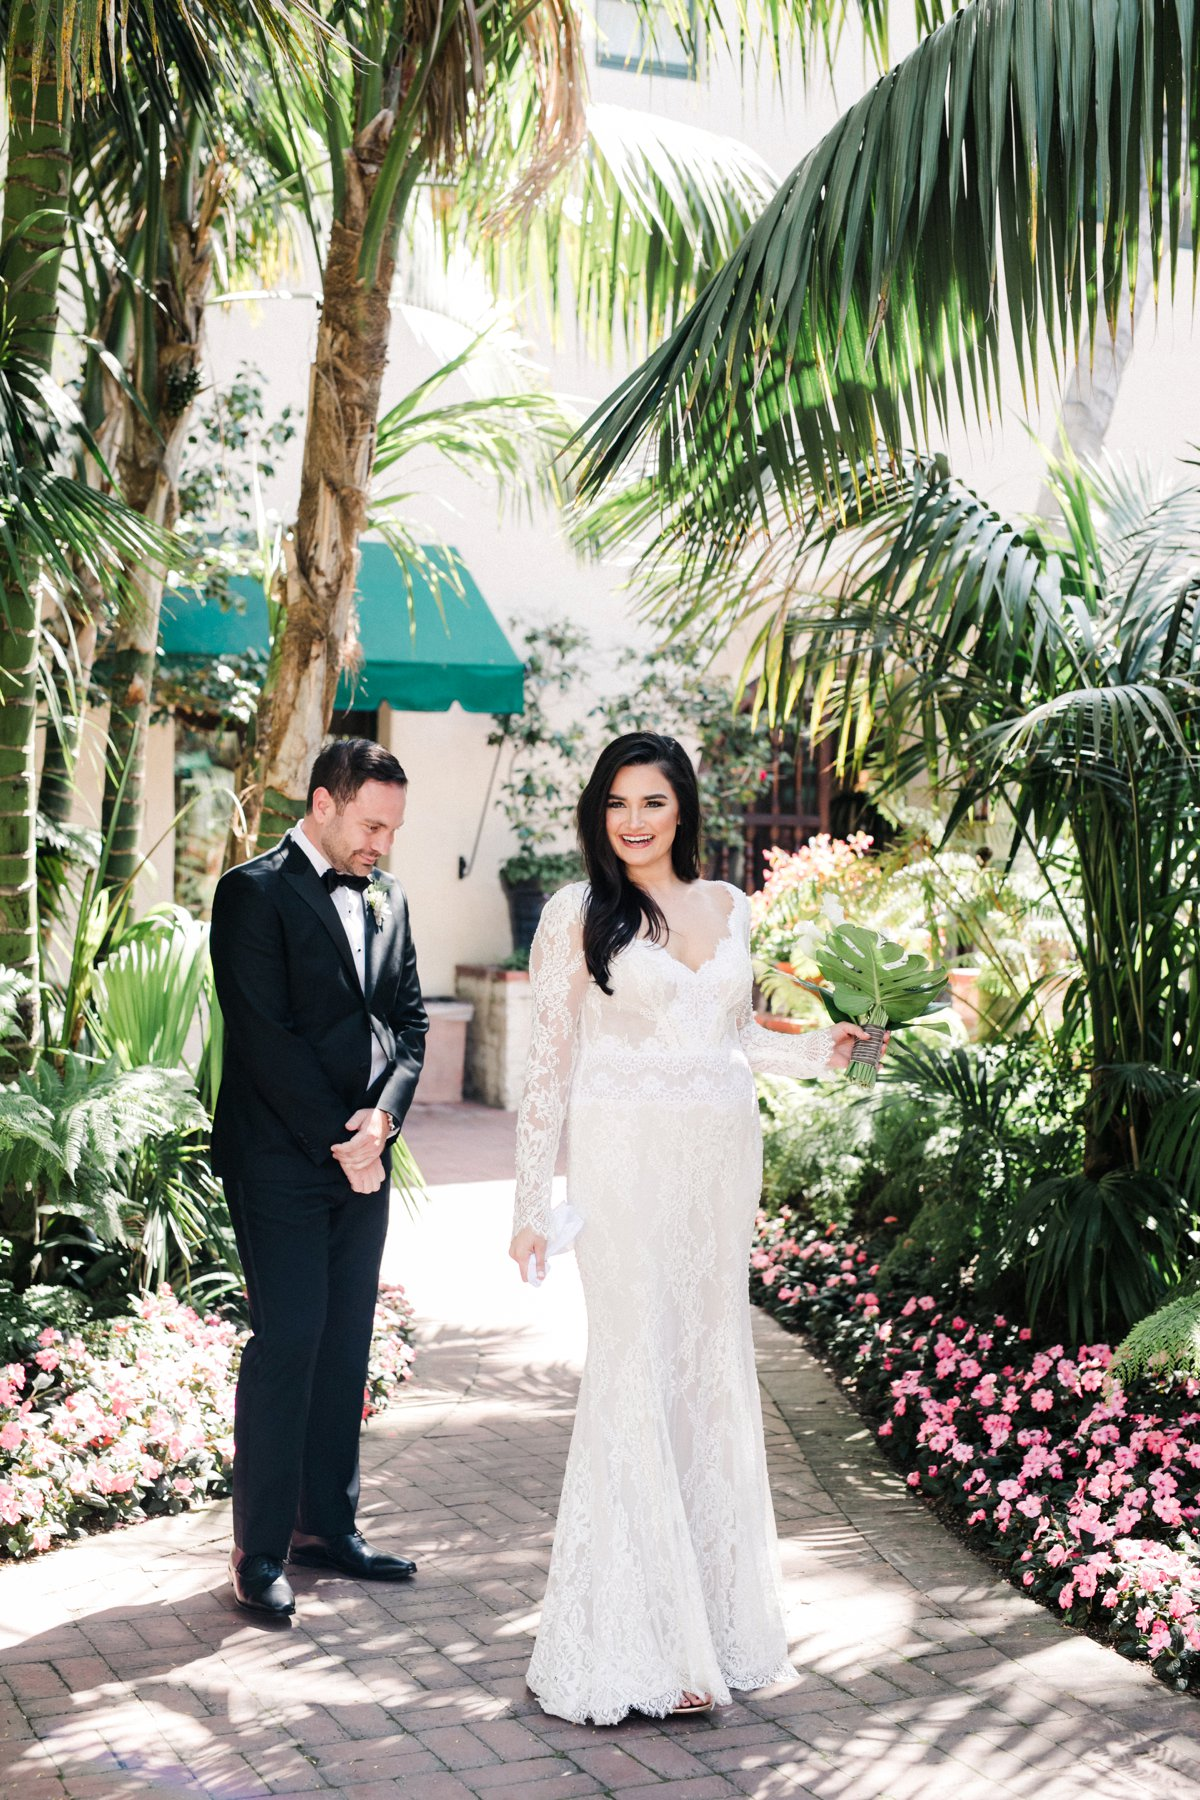 Wedding Dresses Santa Barbara 3 Marvelous wedding first looks photo